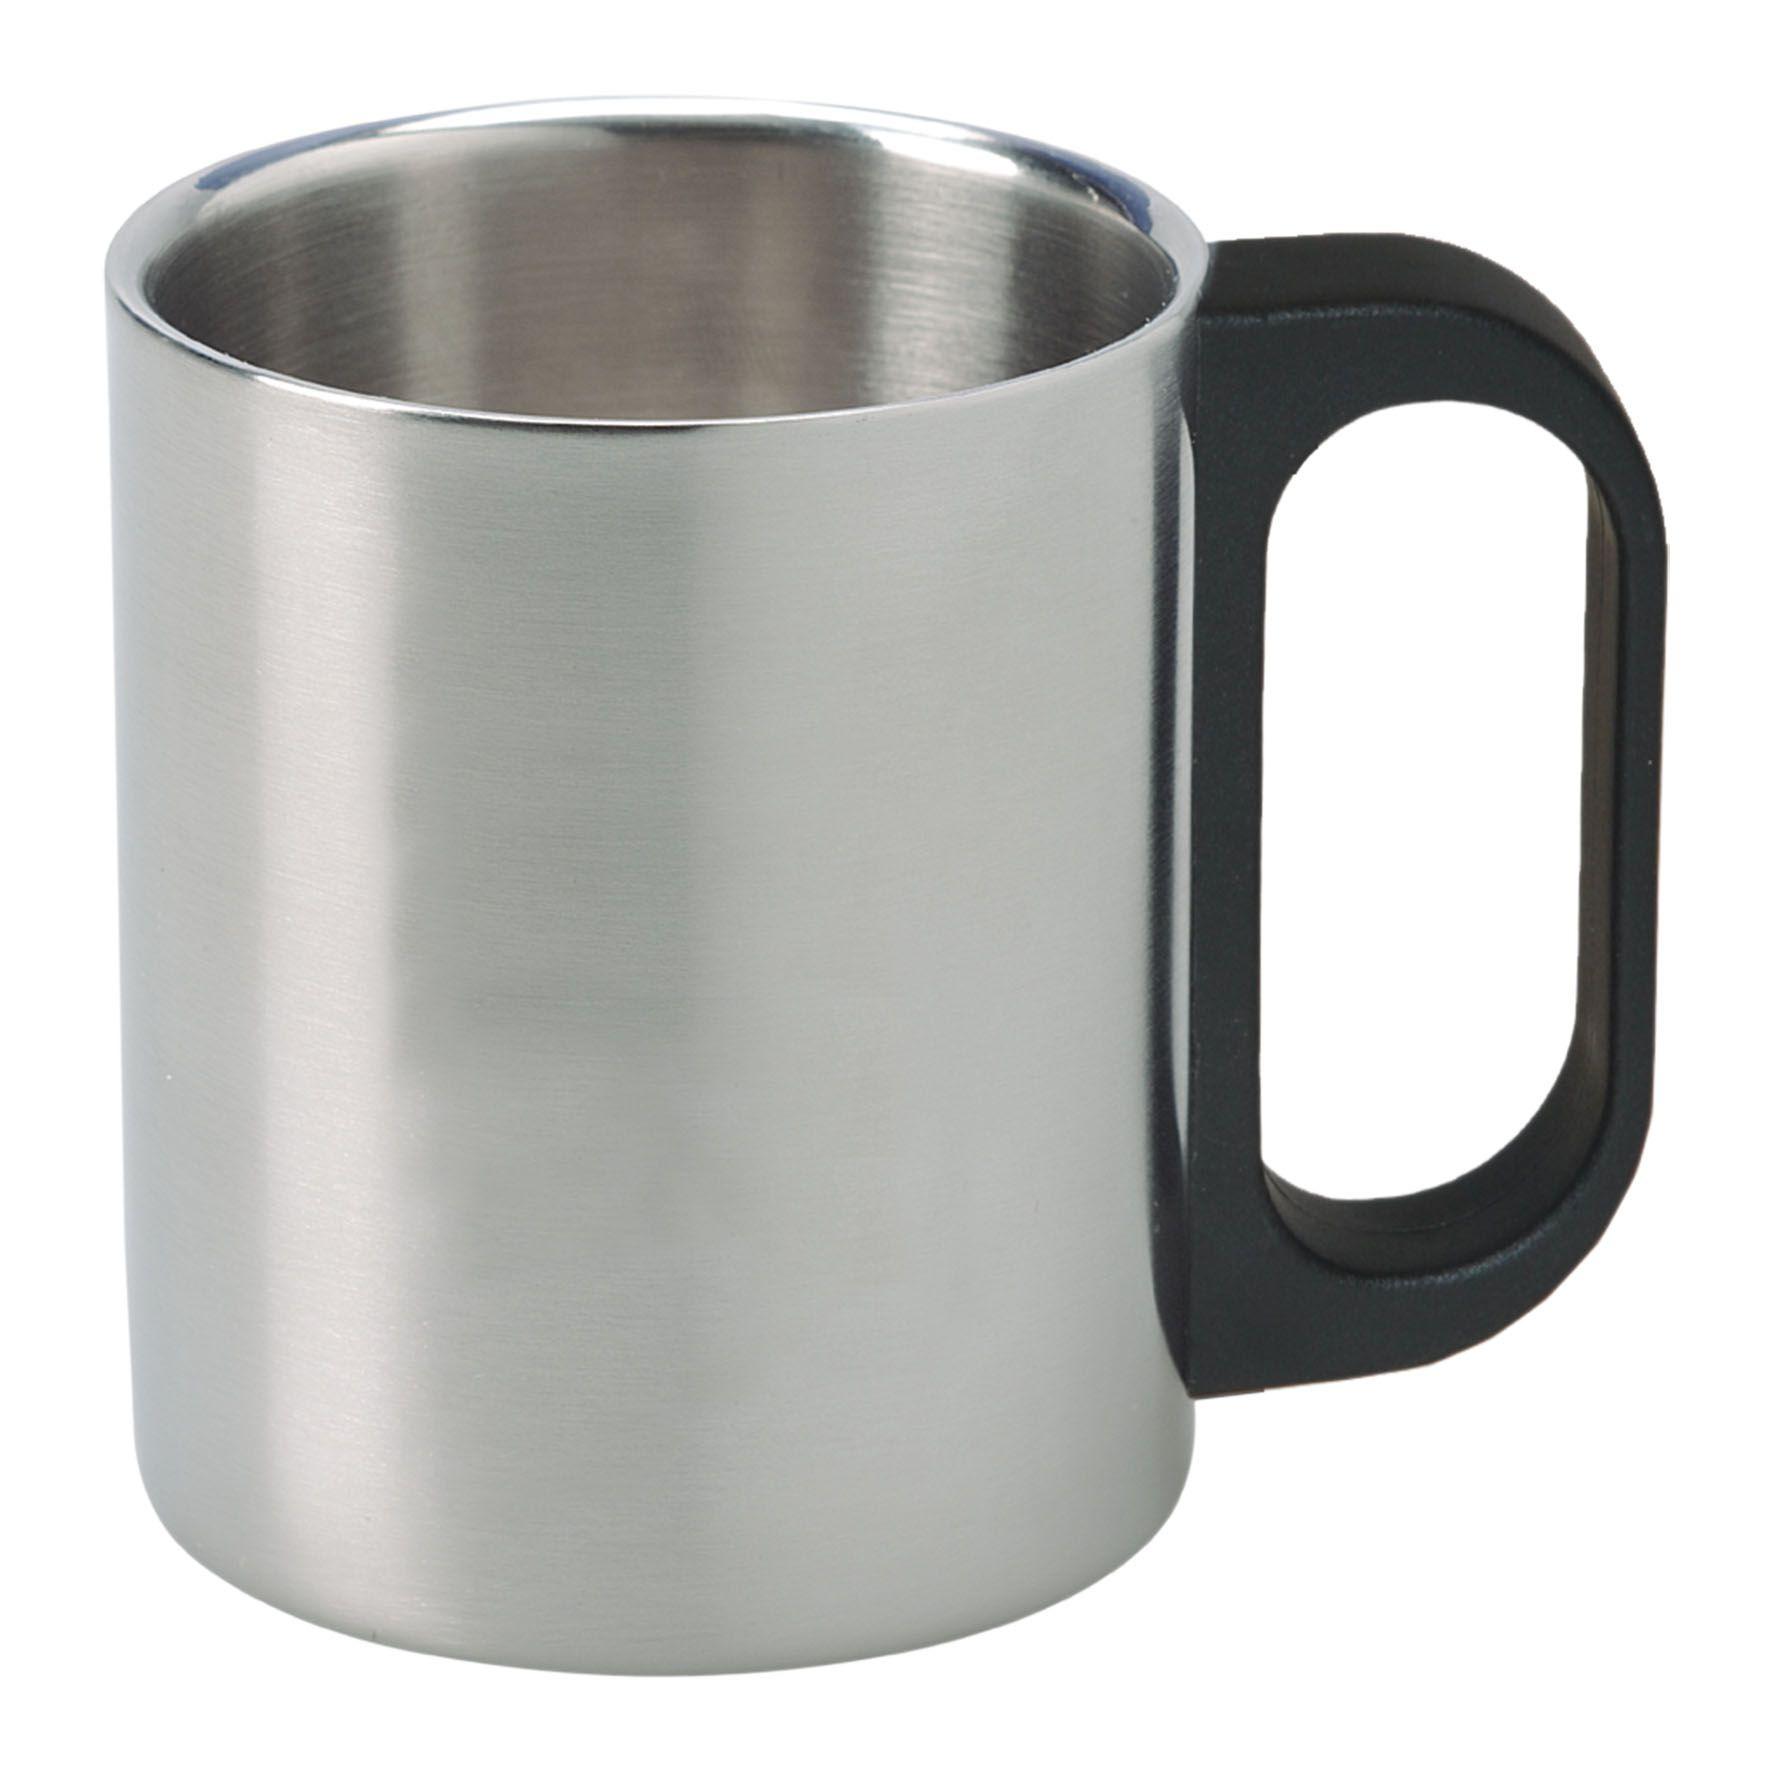 Cadeau publicitaire - Mug publicitaire isotherme inox 22cl Timbali